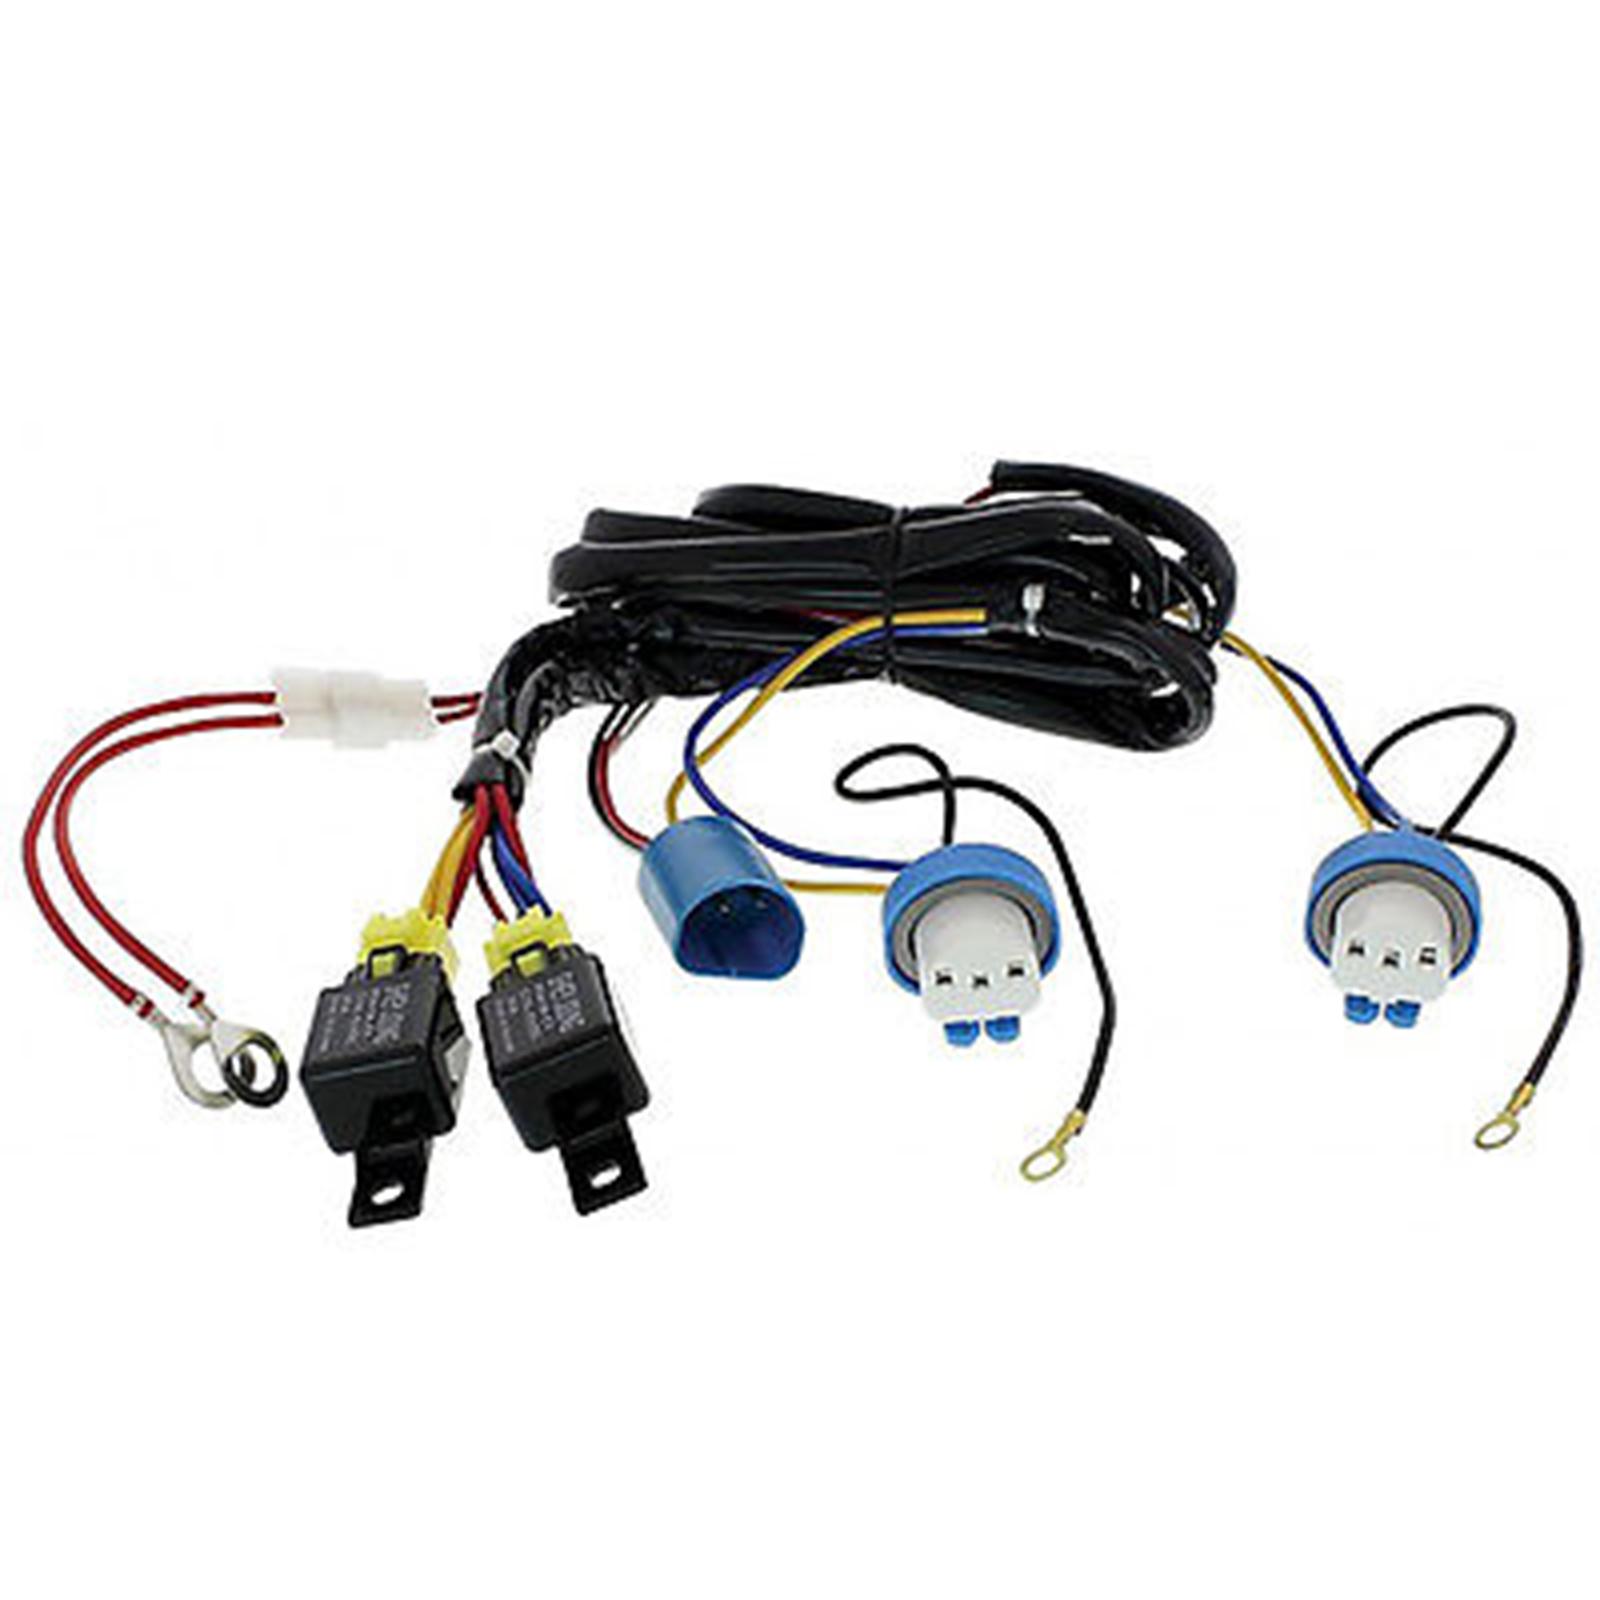 hight resolution of h4 9007 headlight headlamp relay harness wiring 12v kit